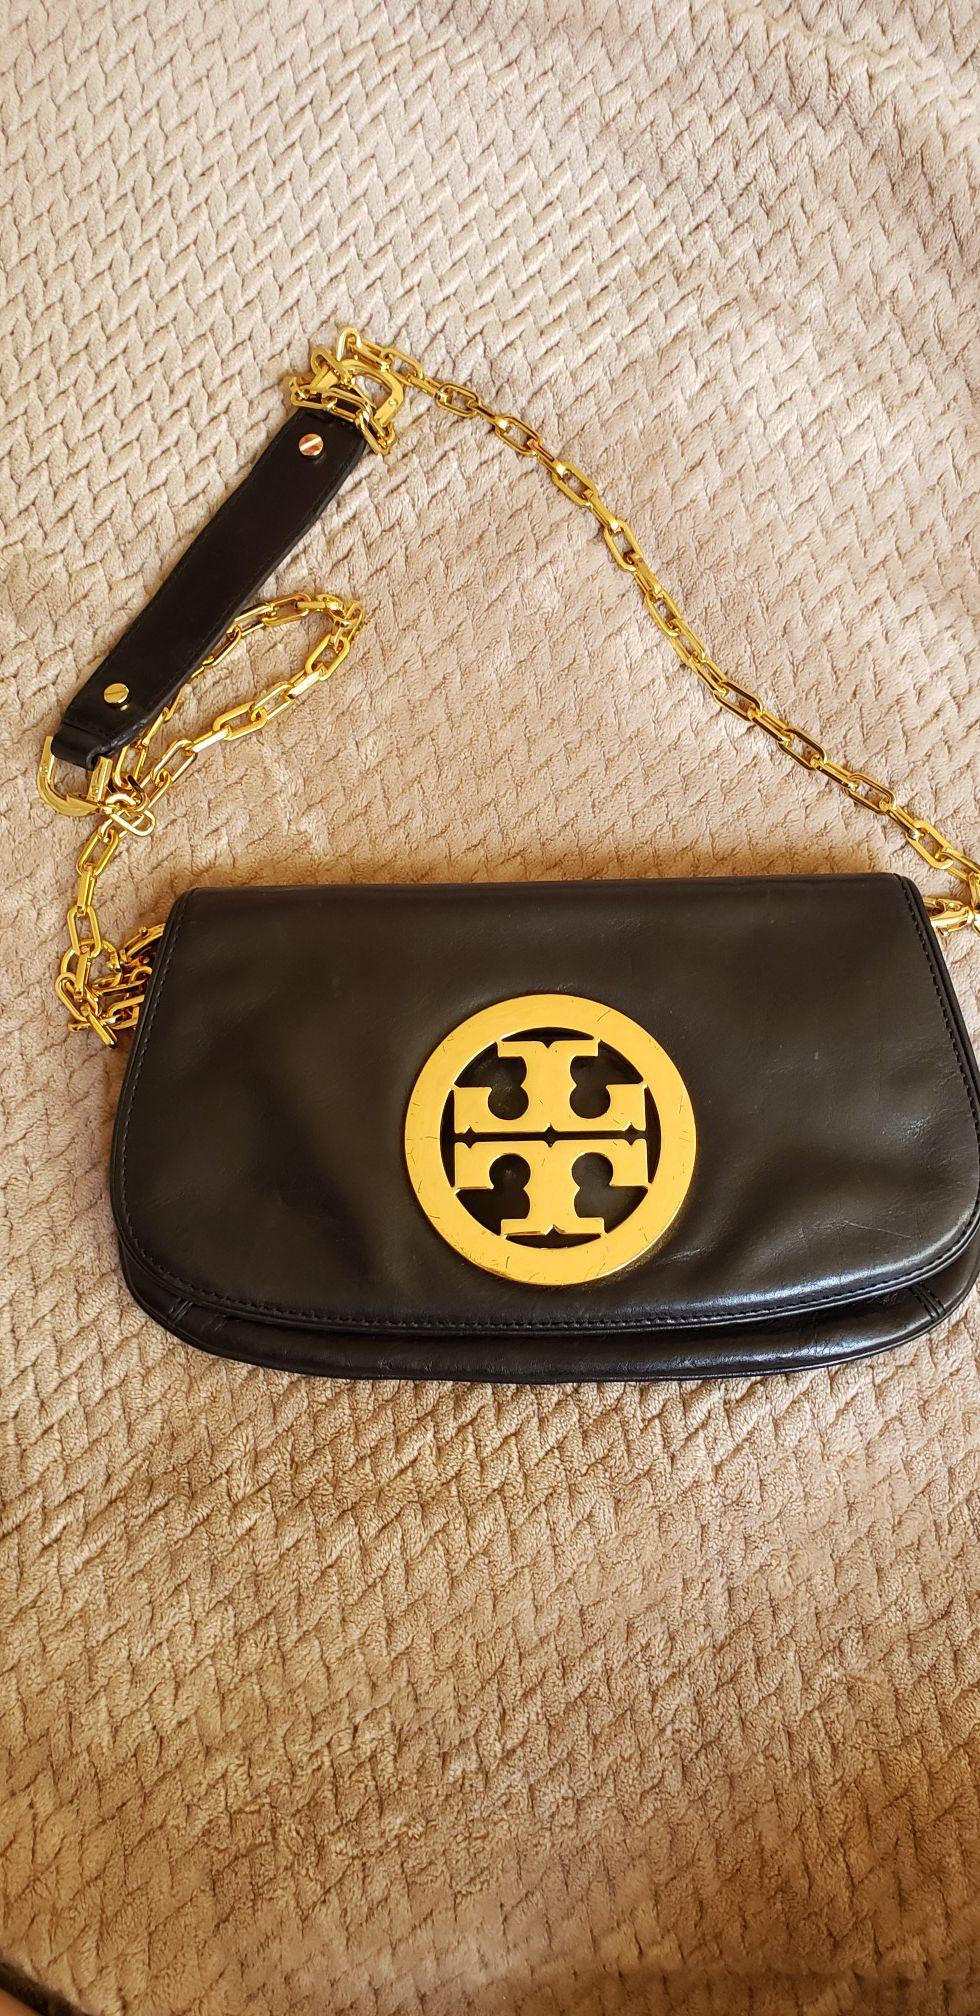 Tory Burch Crossbody Bag